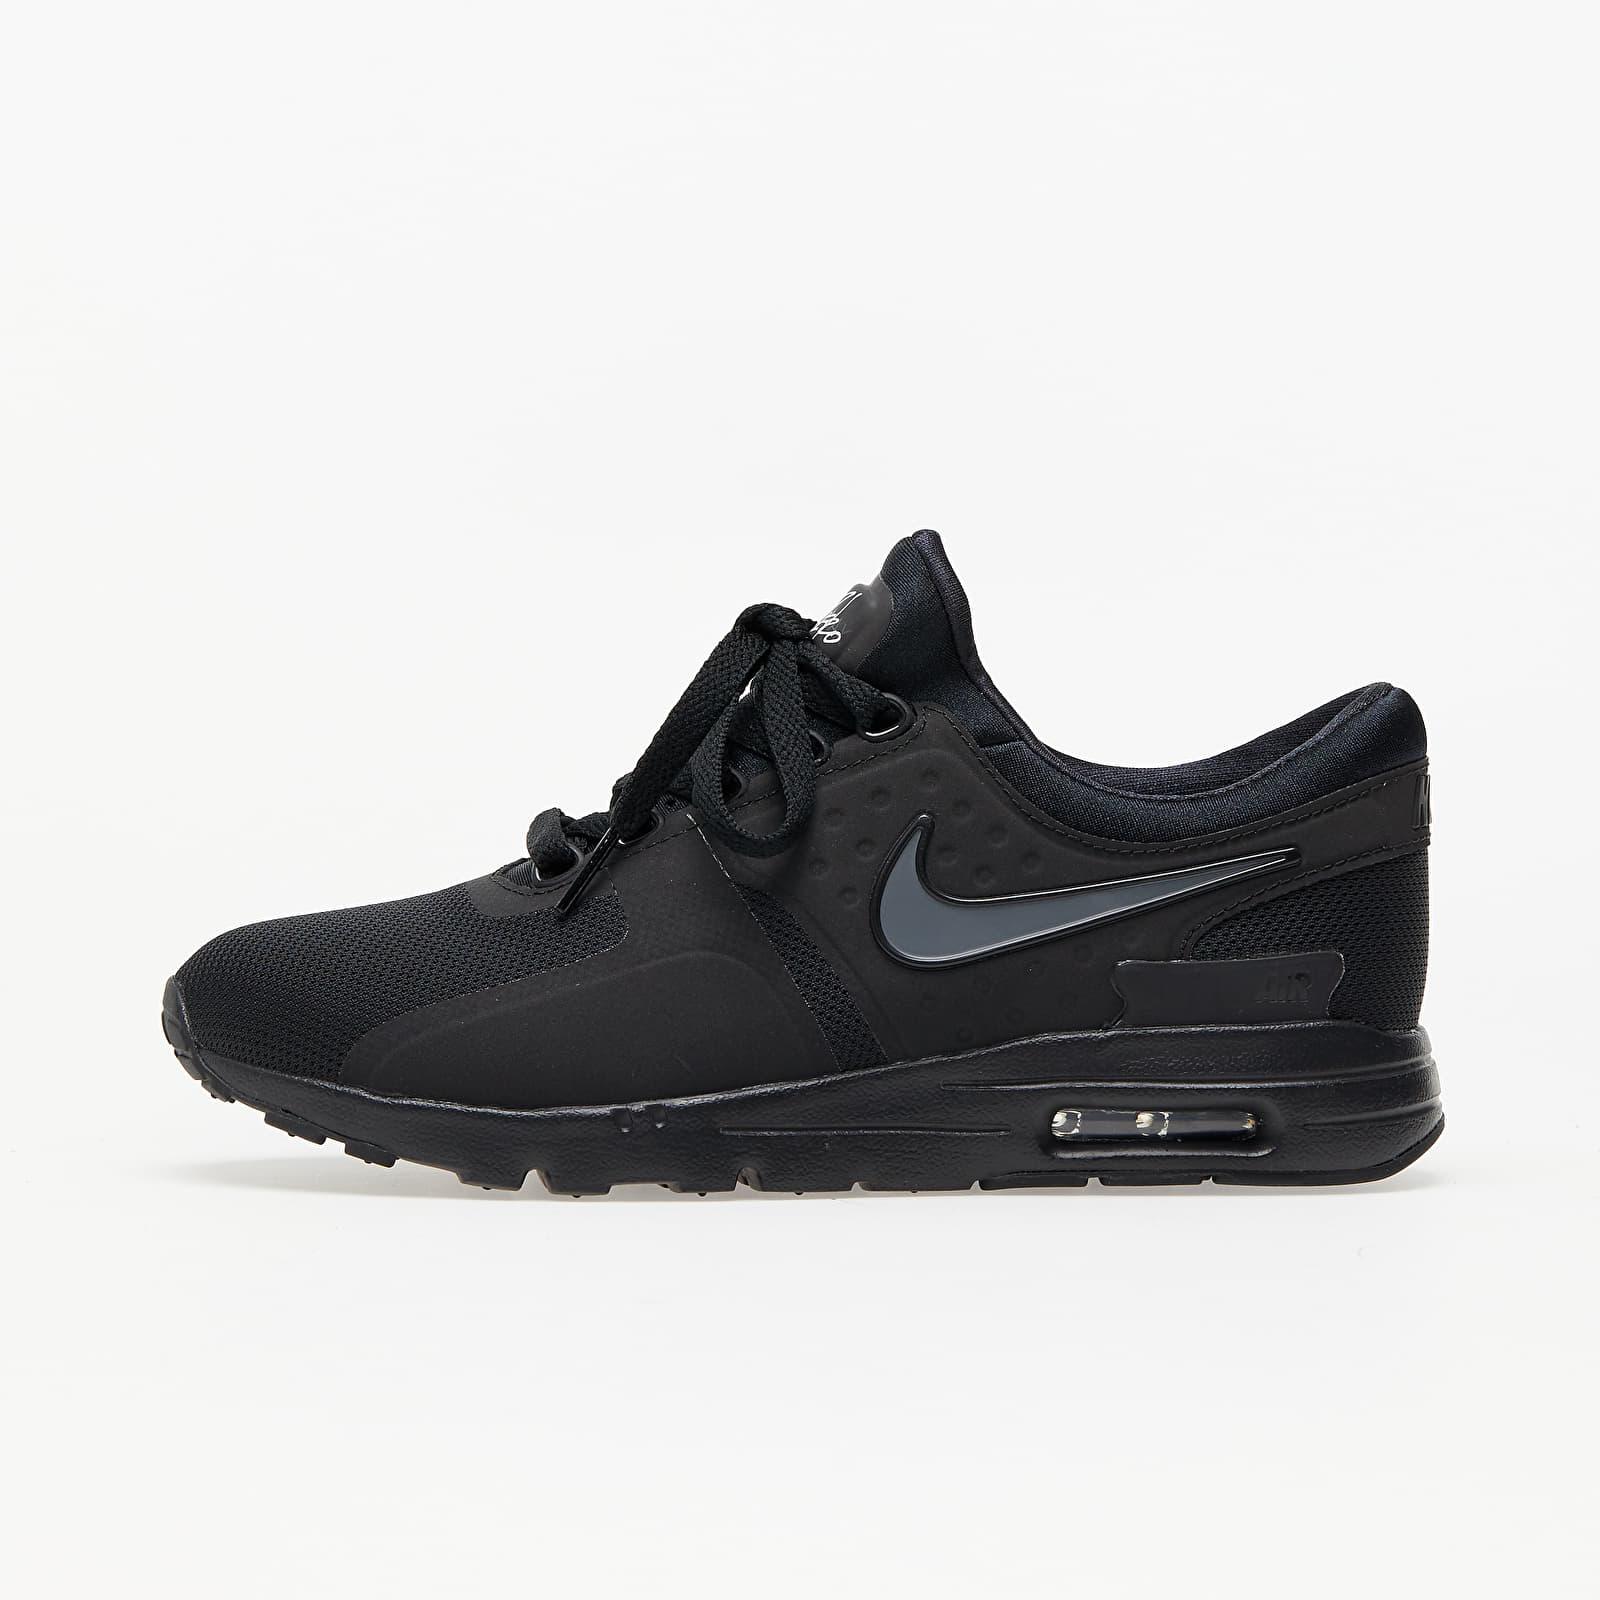 Дамски кецове и обувки Nike W Air Max Zero Black/ Black-Dark Grey-White